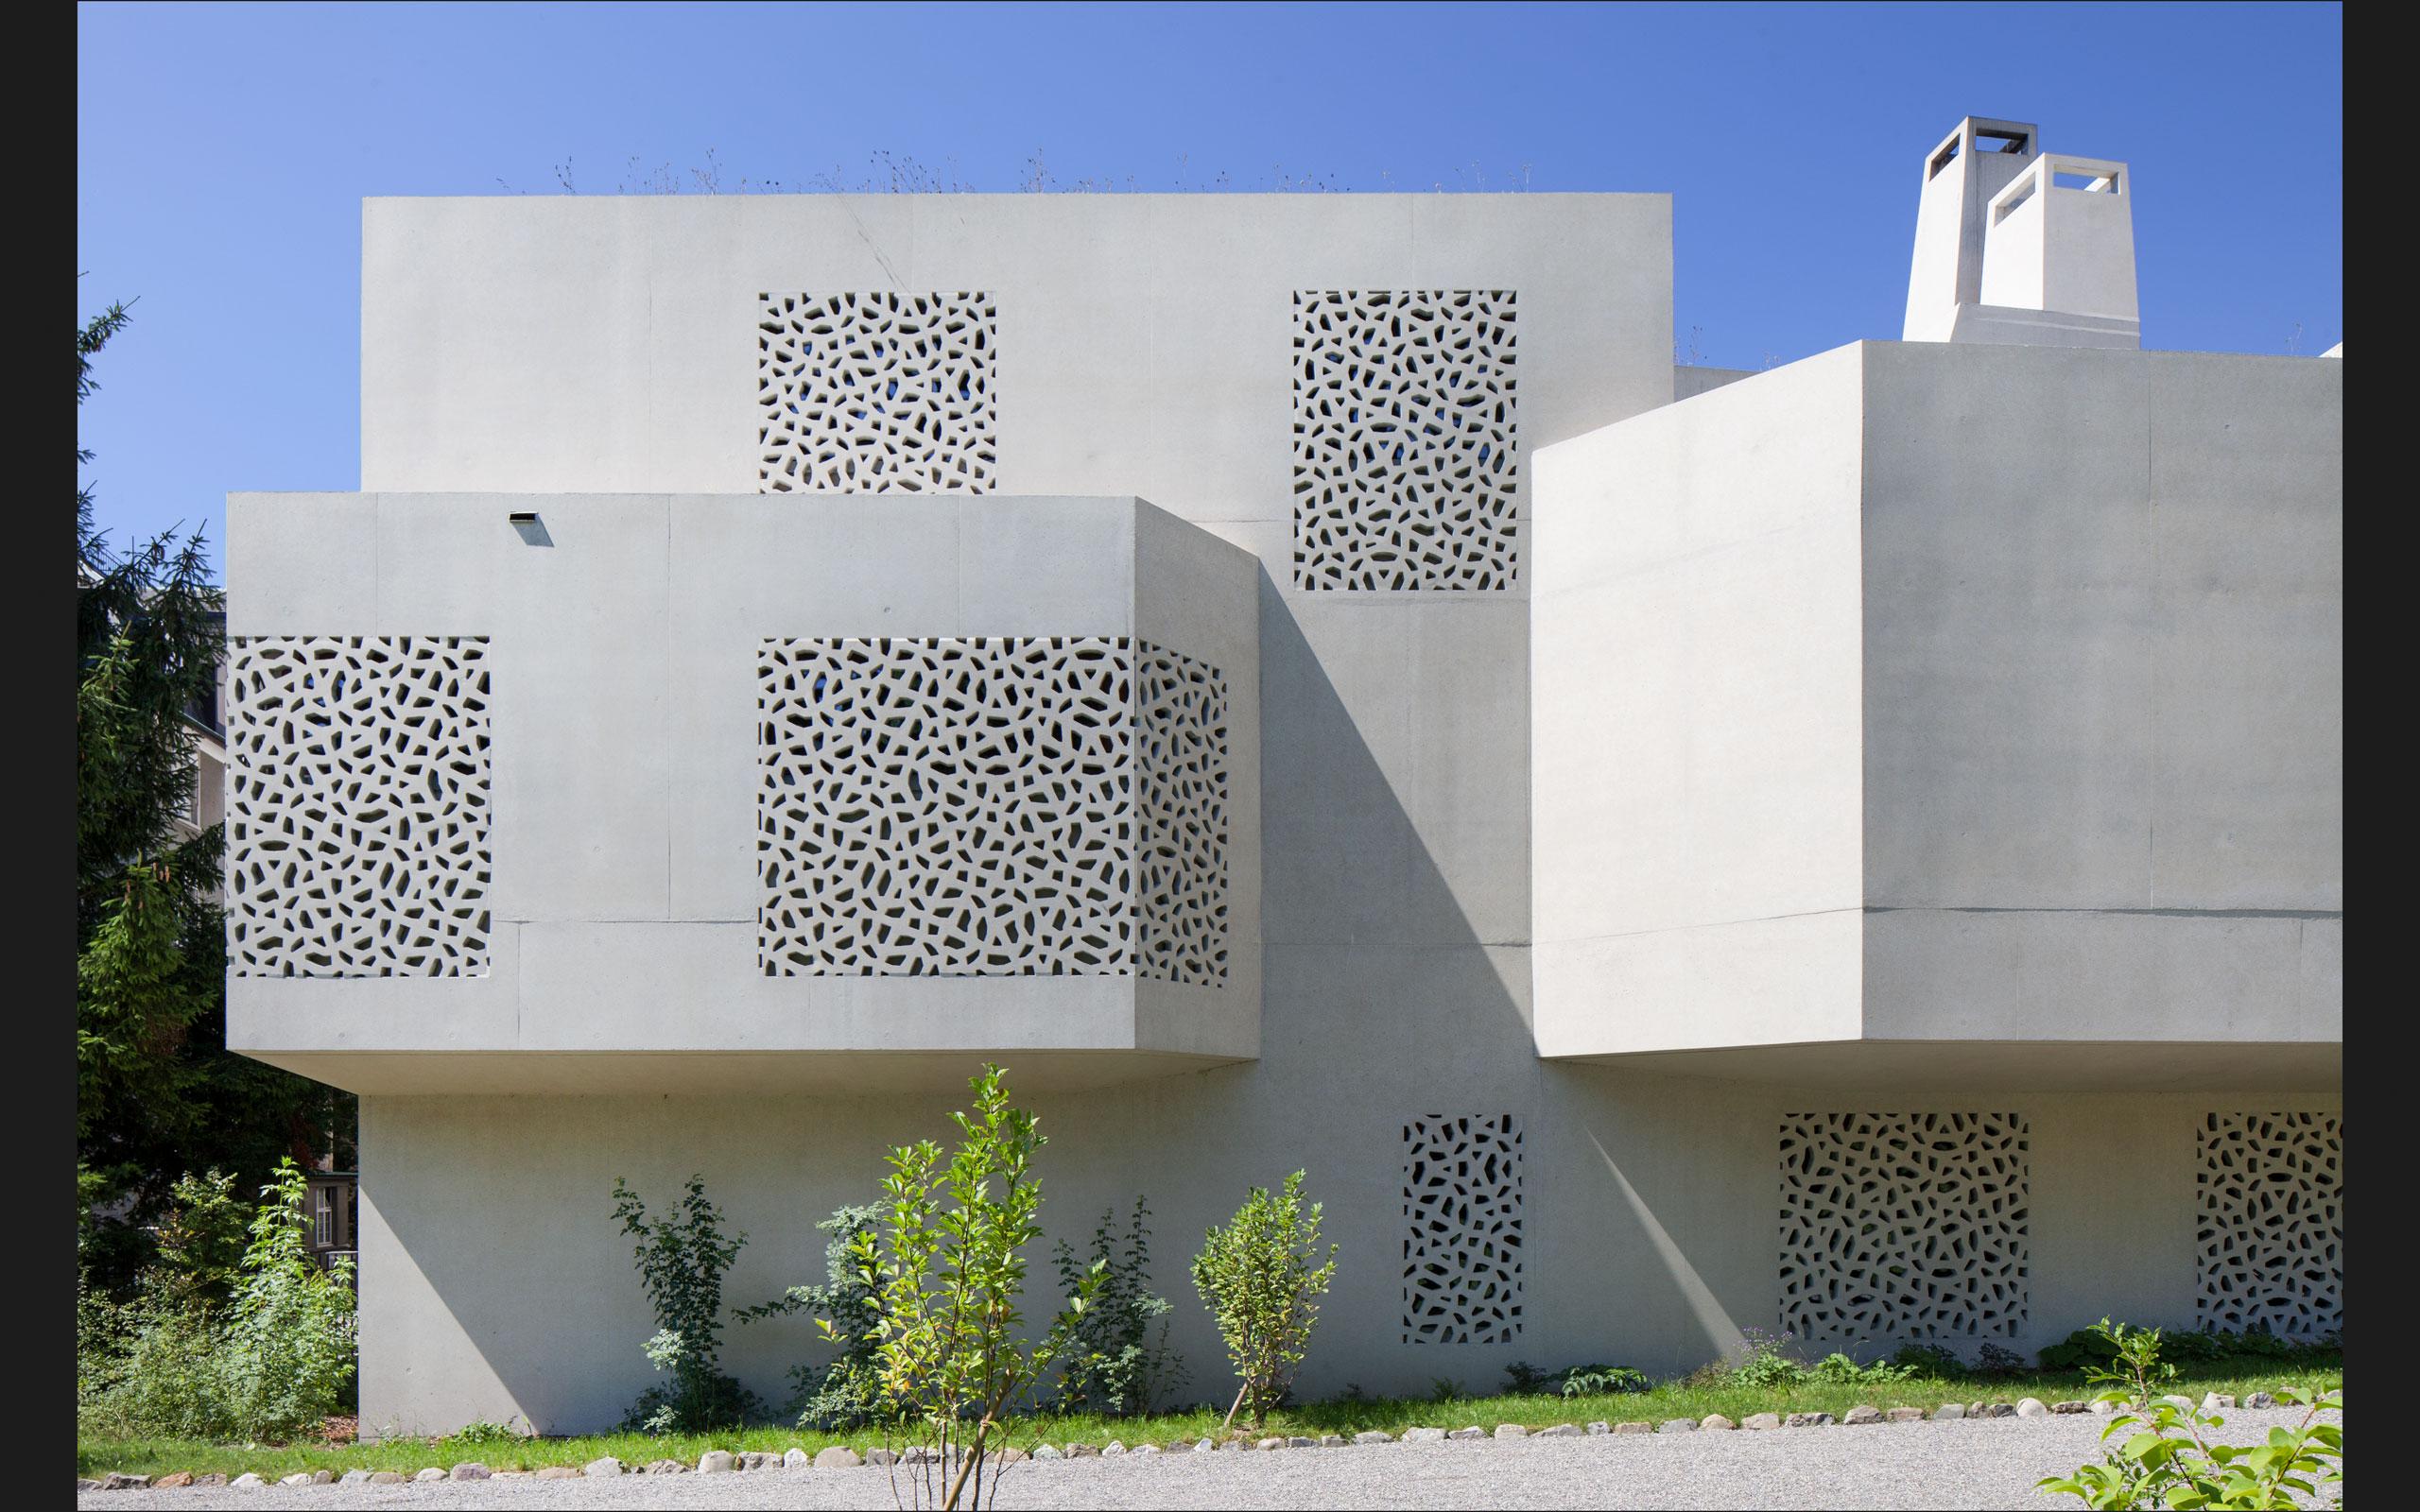 Architektur: Miller & Maranta, Basel, Patumbah Zürich